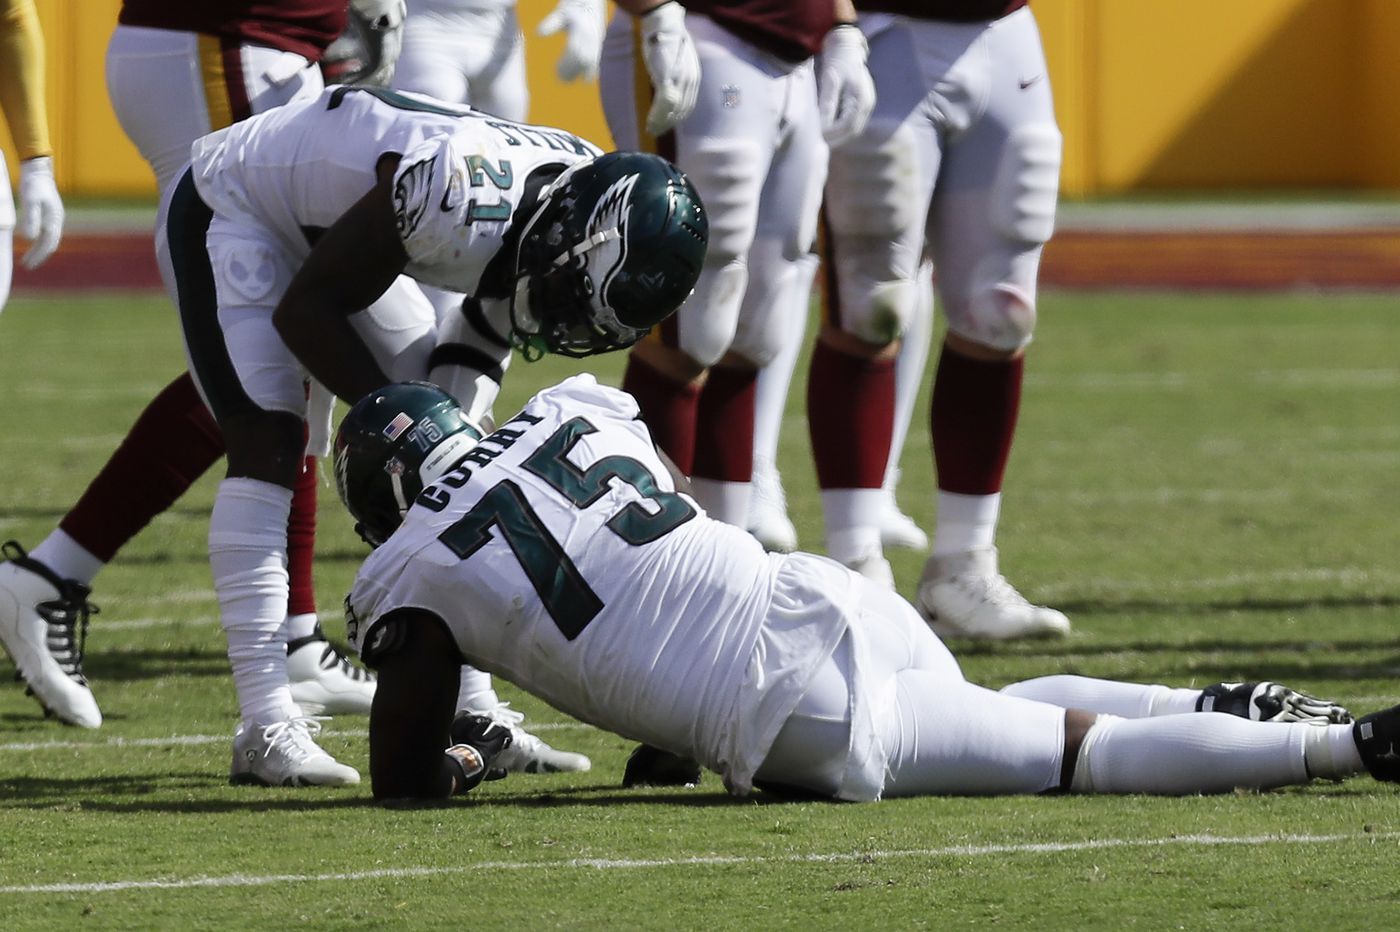 Eagles' injuries start piling up again in season-opening loss to Washington